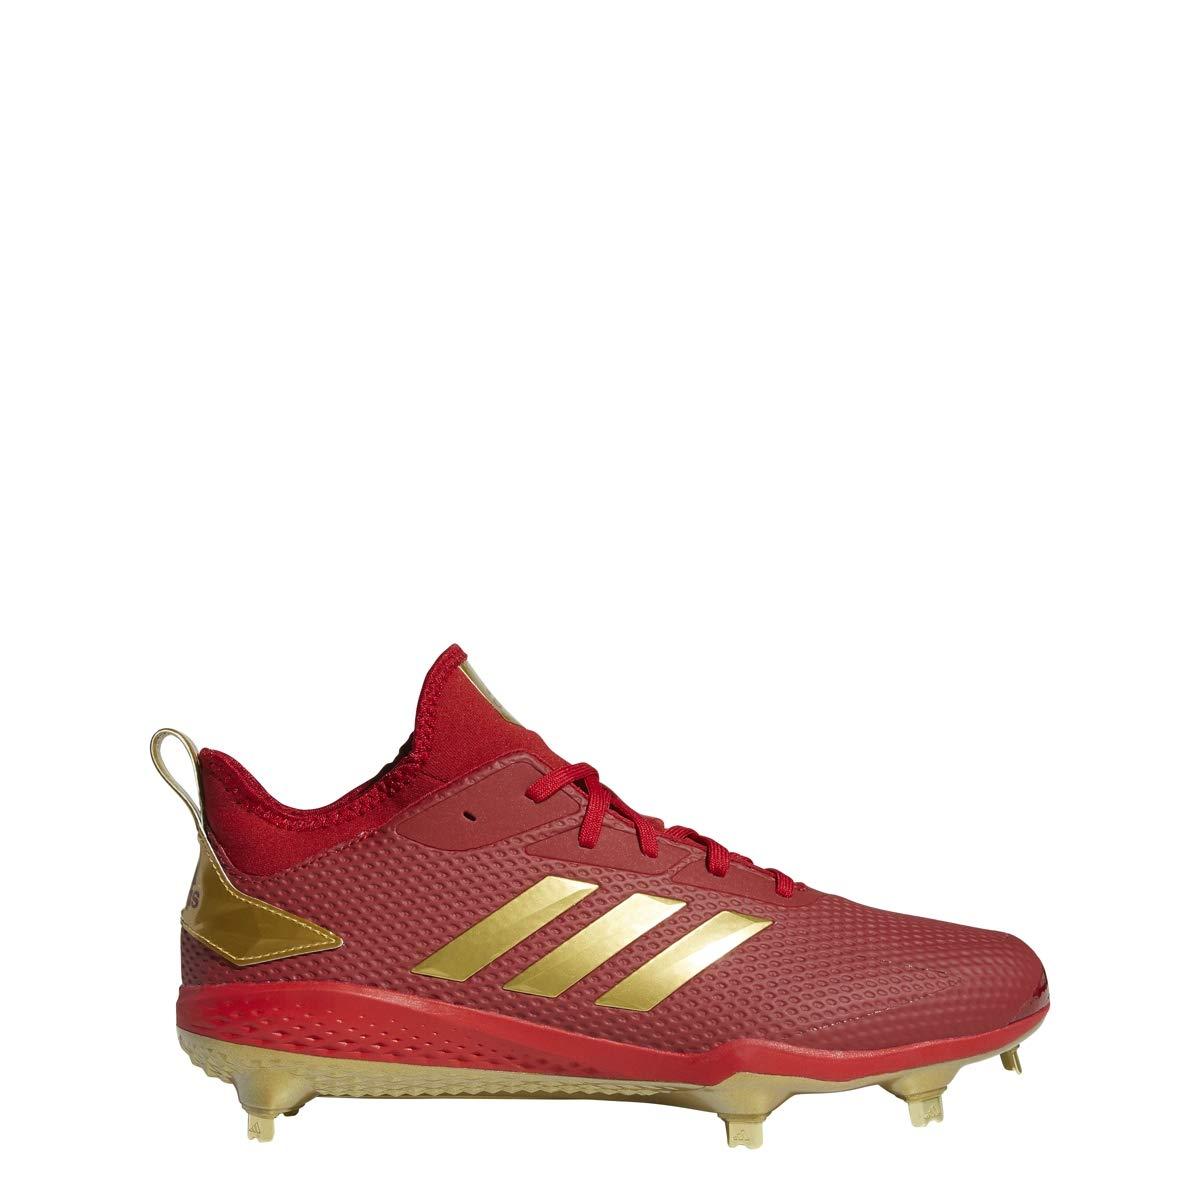 Adidas herren Calzado Atlético, Größe rot